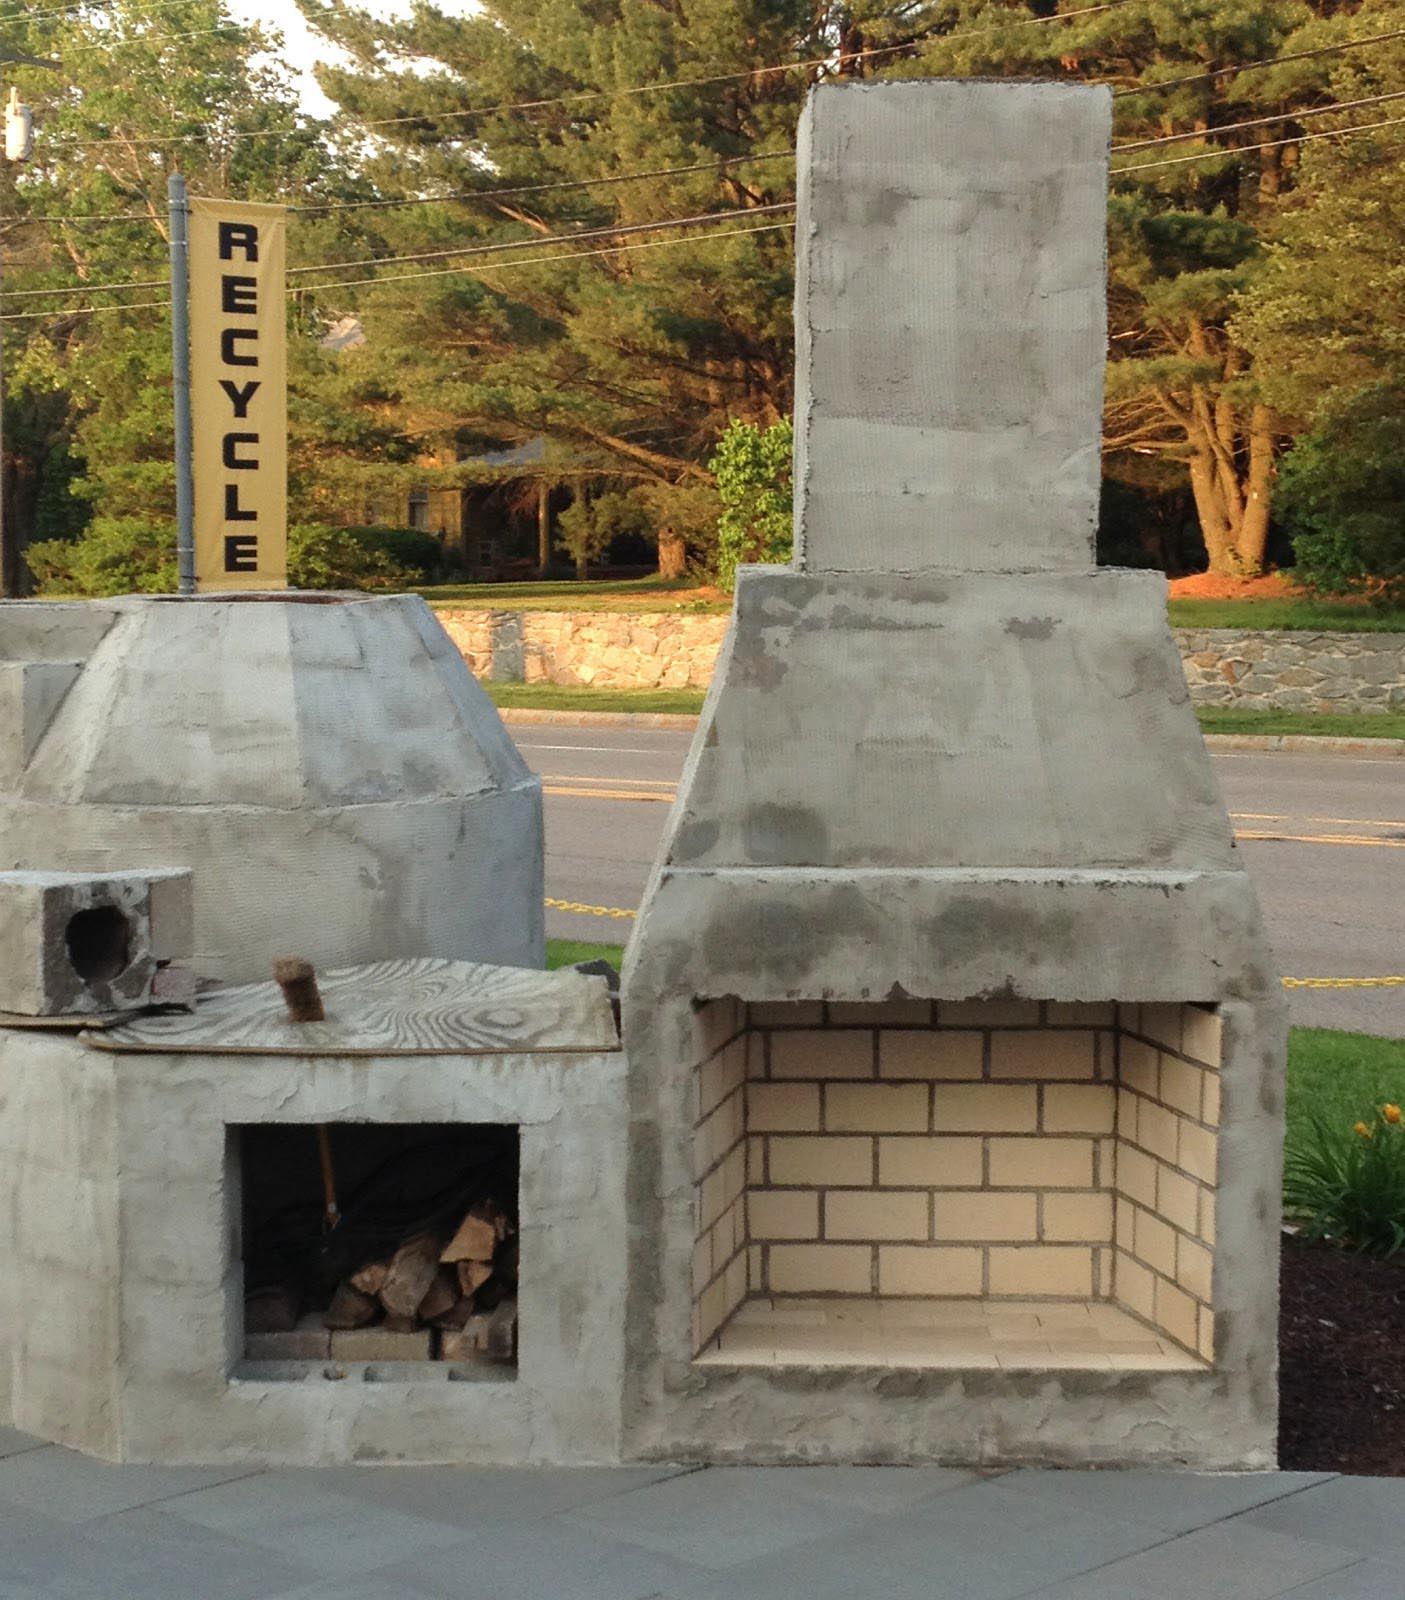 Diy Outdoor Fireplace Plans Fireplace Designs